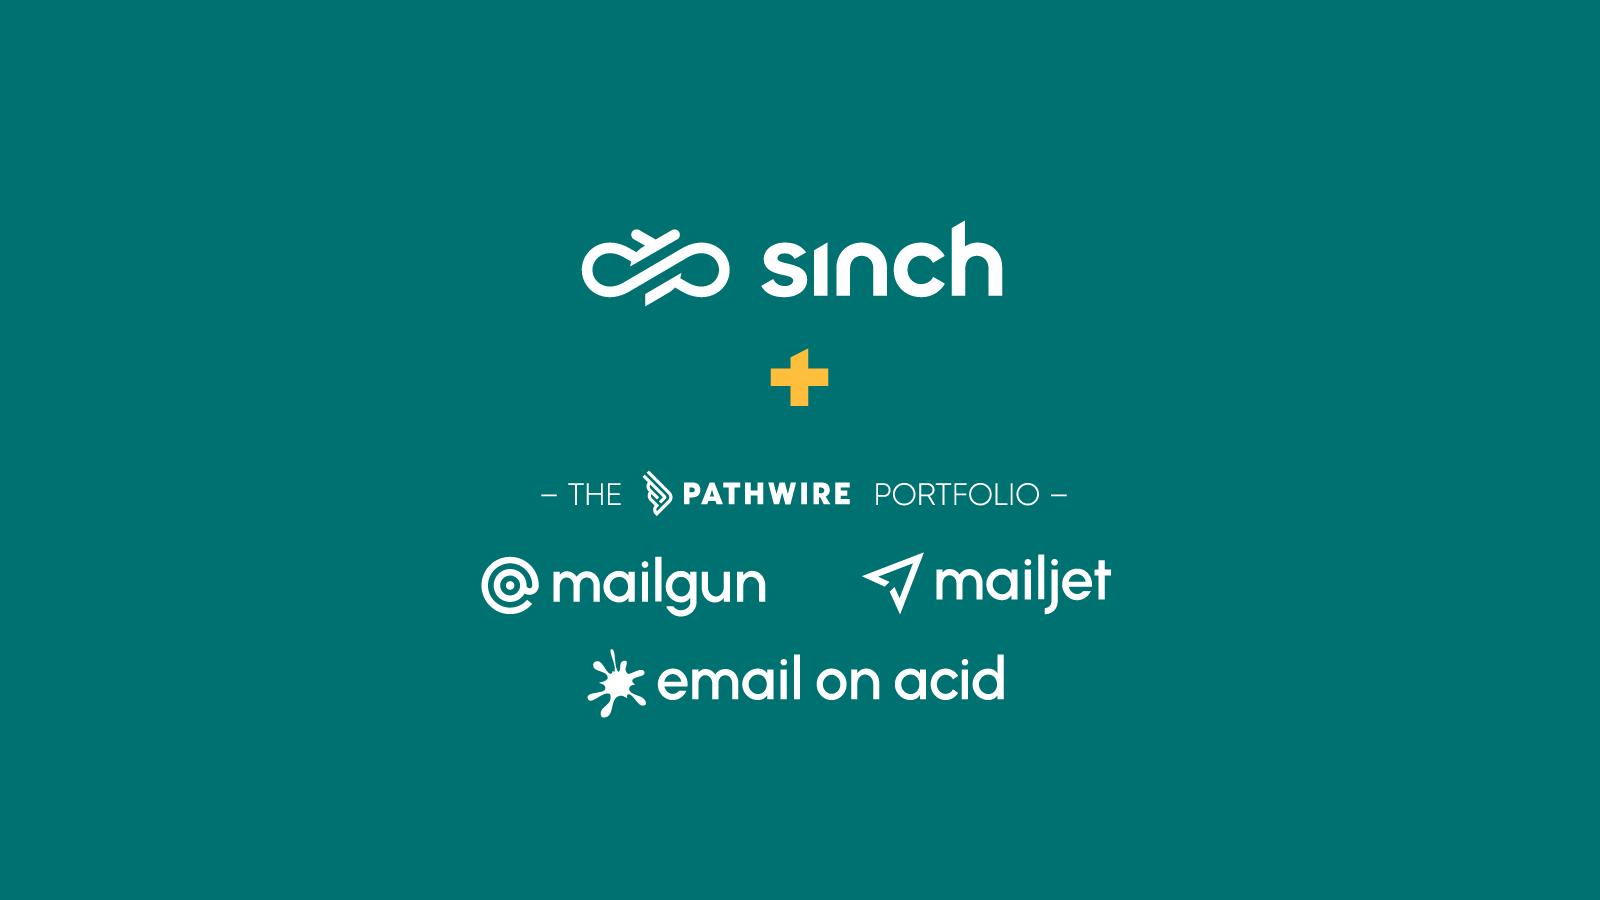 Sinch + Pathwire